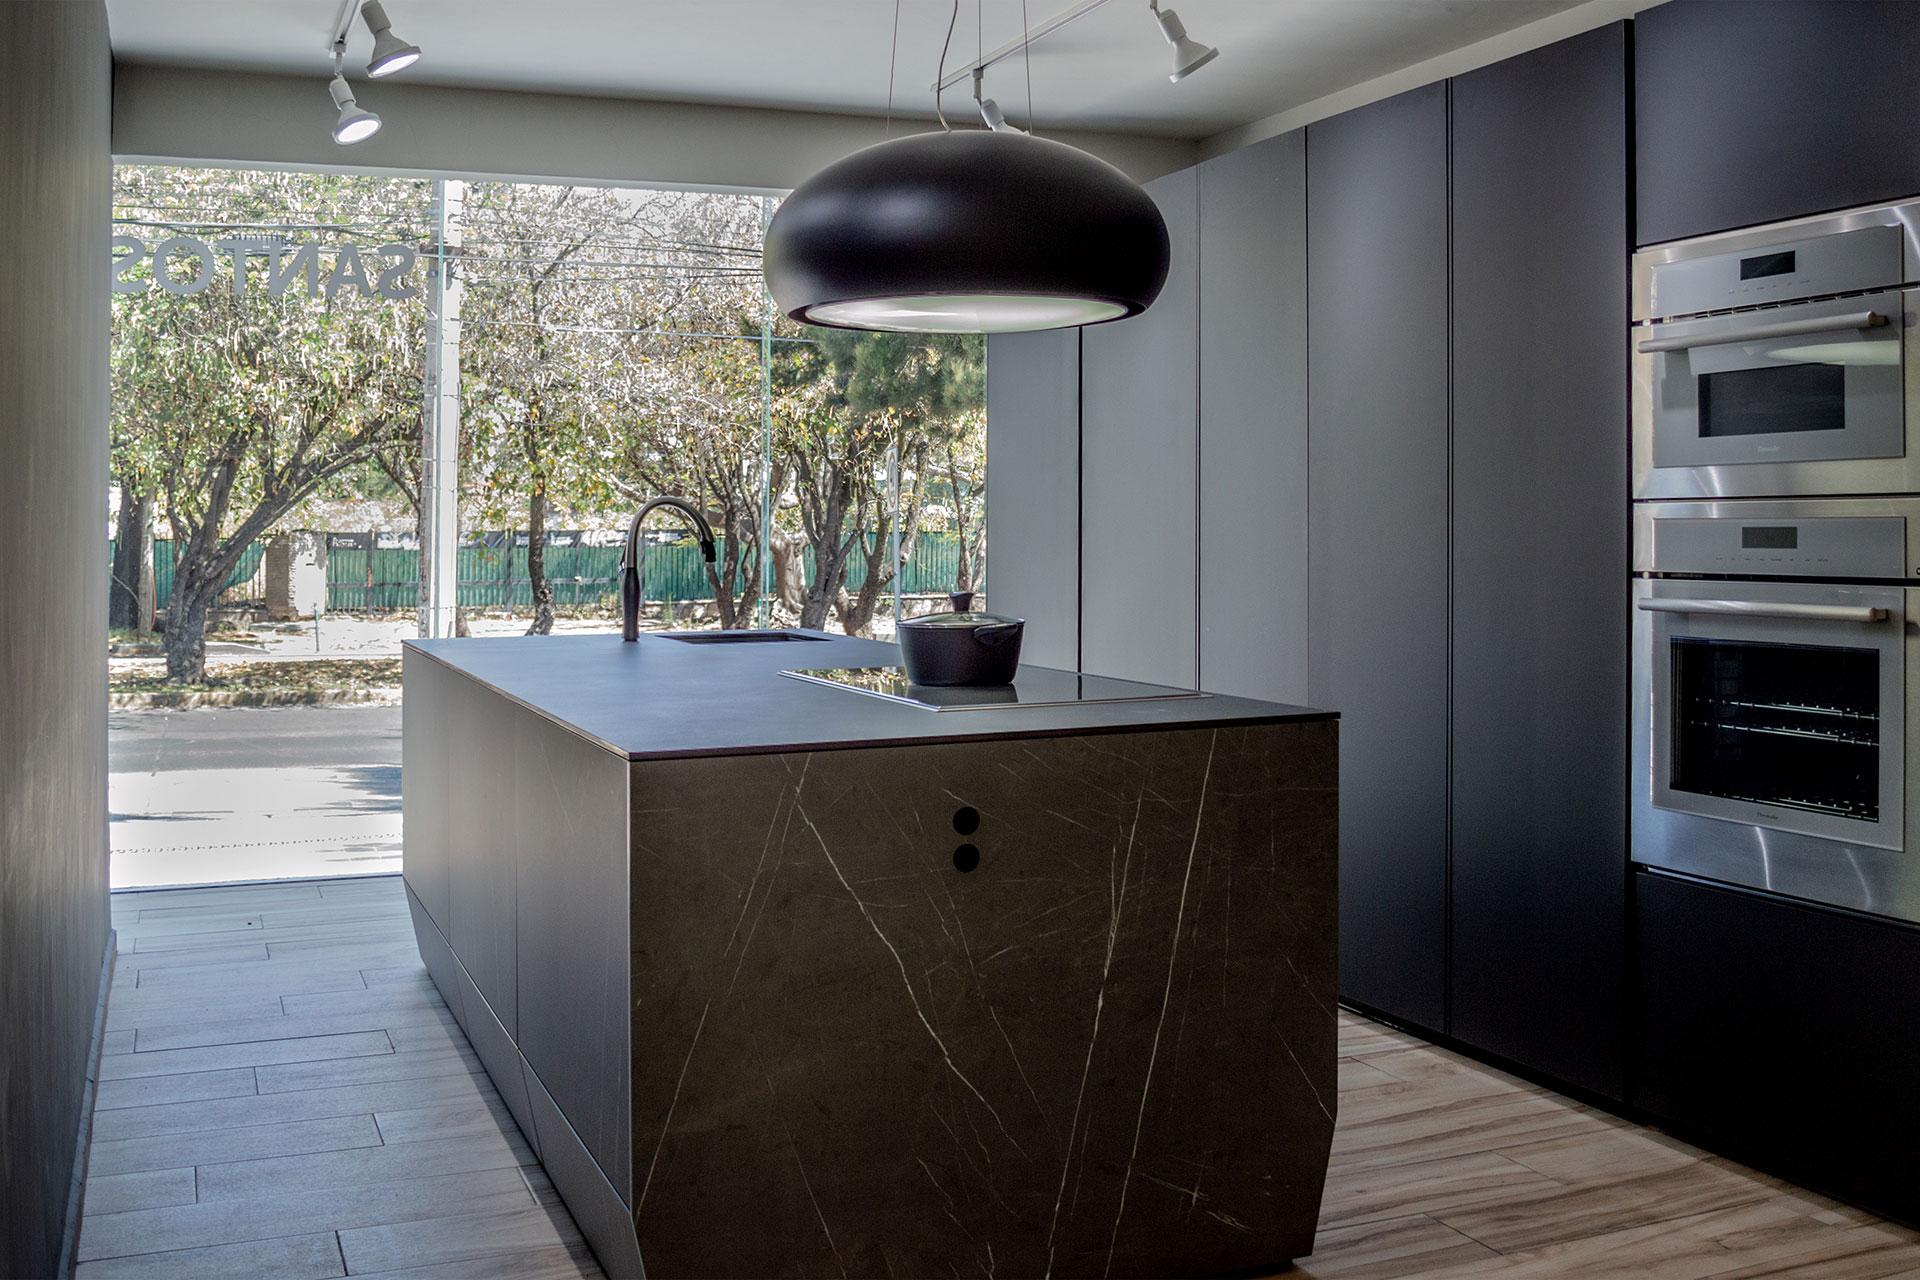 Santos Guadalajara, the new and exclusive Santos kitchen showroom in Mexico